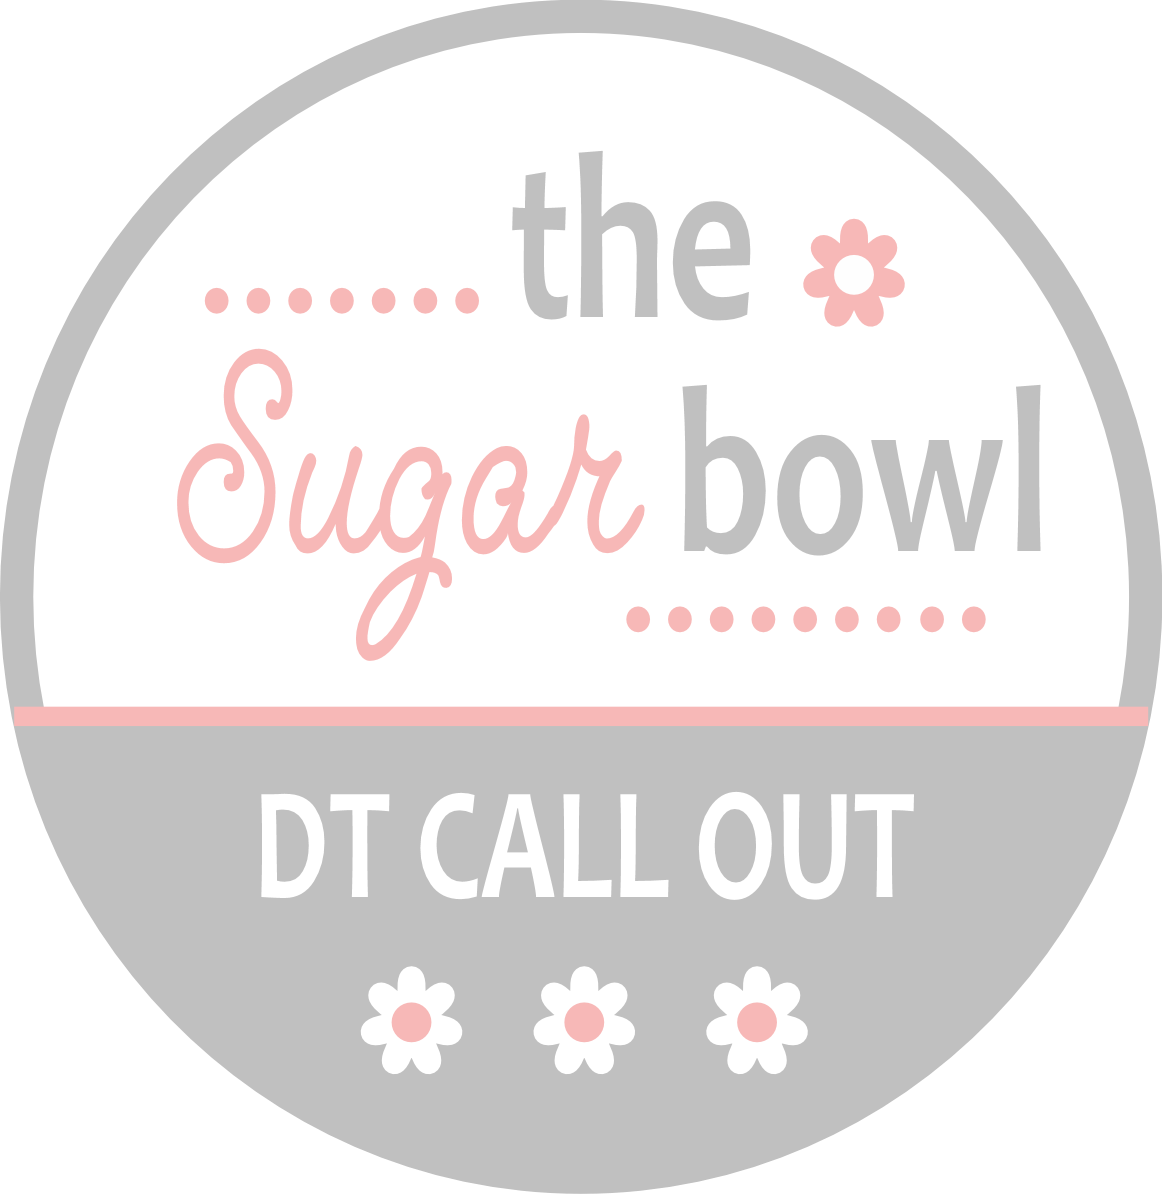 http://sugarbowlblog.blogspot.ca/